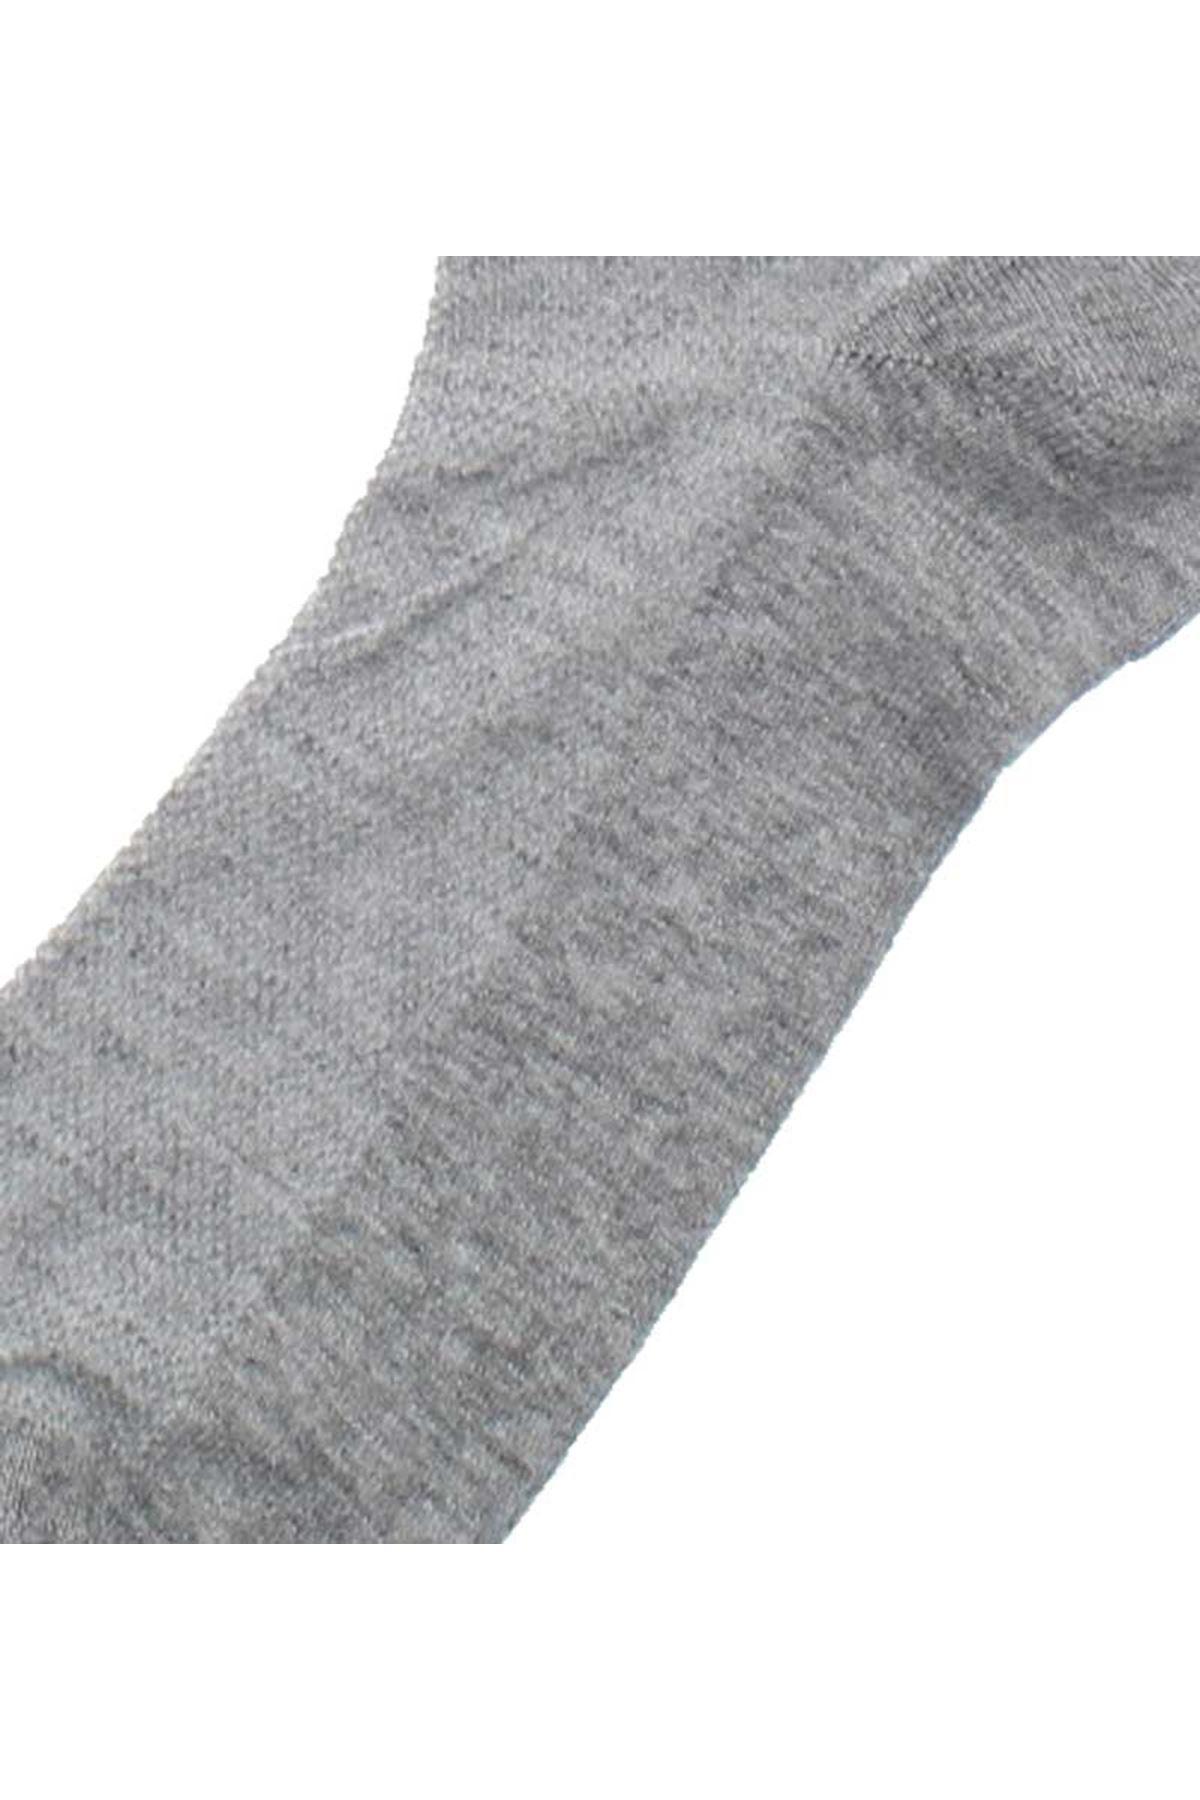 By Jawalli Bambu Erkek Patik Çorap